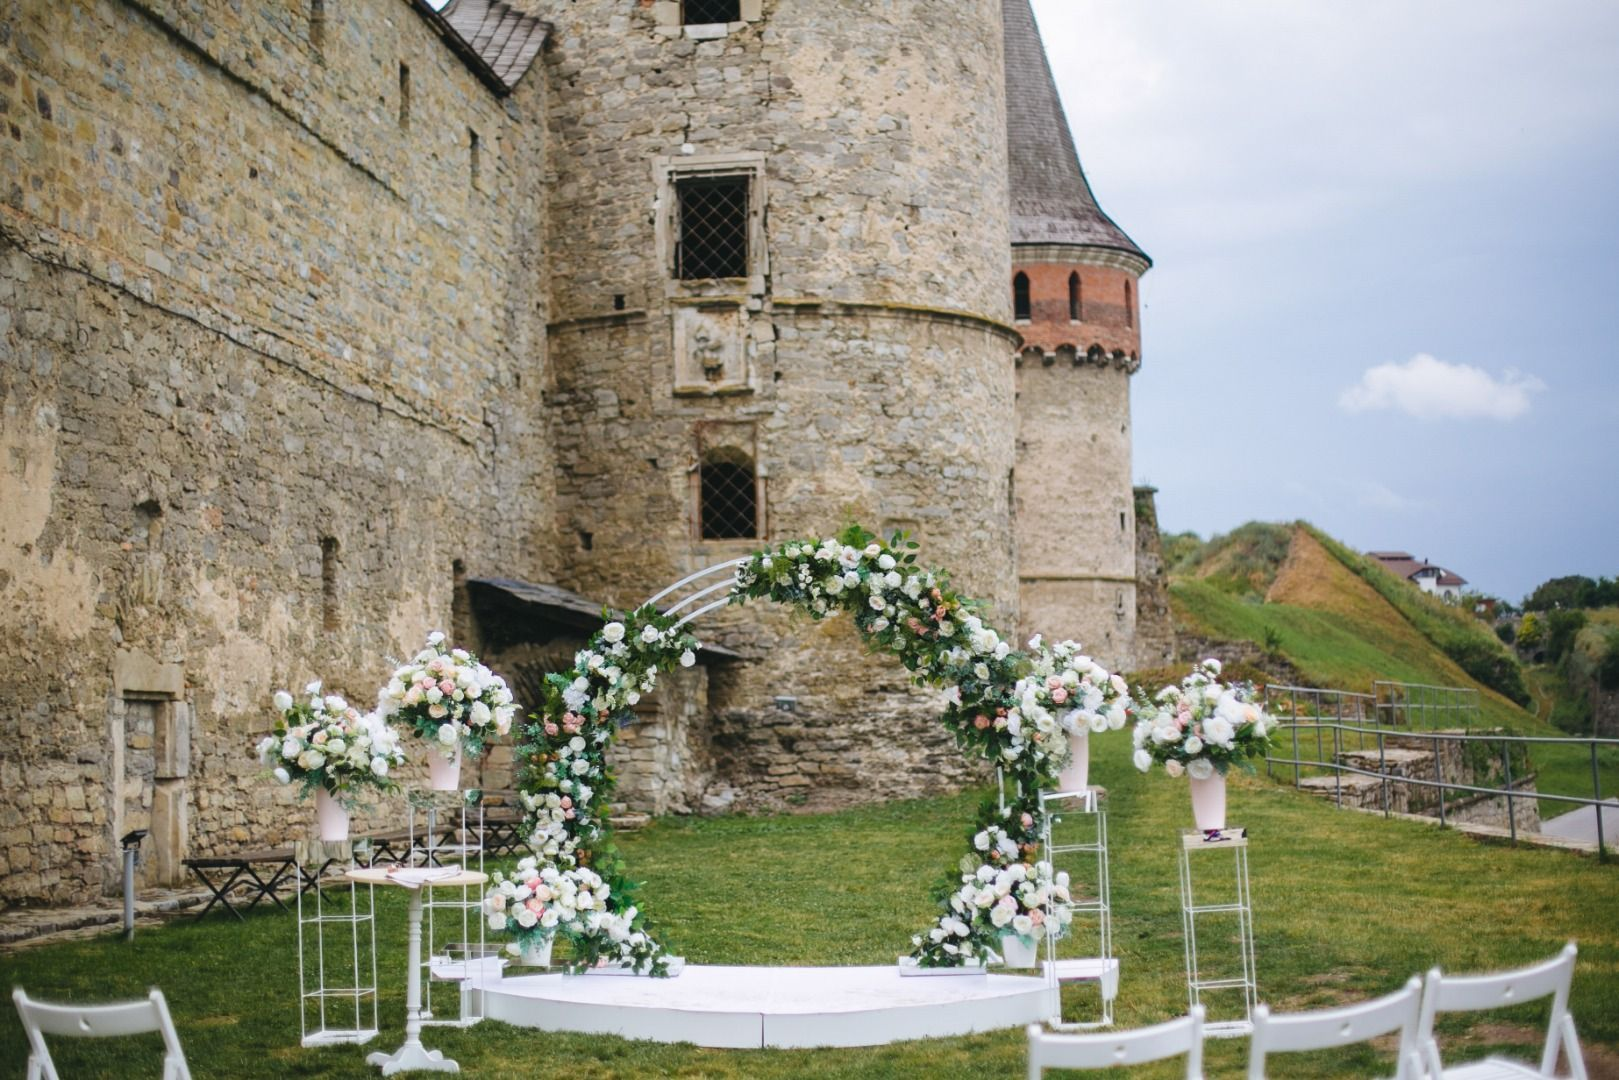 Hochzeitslocations in Bamberg